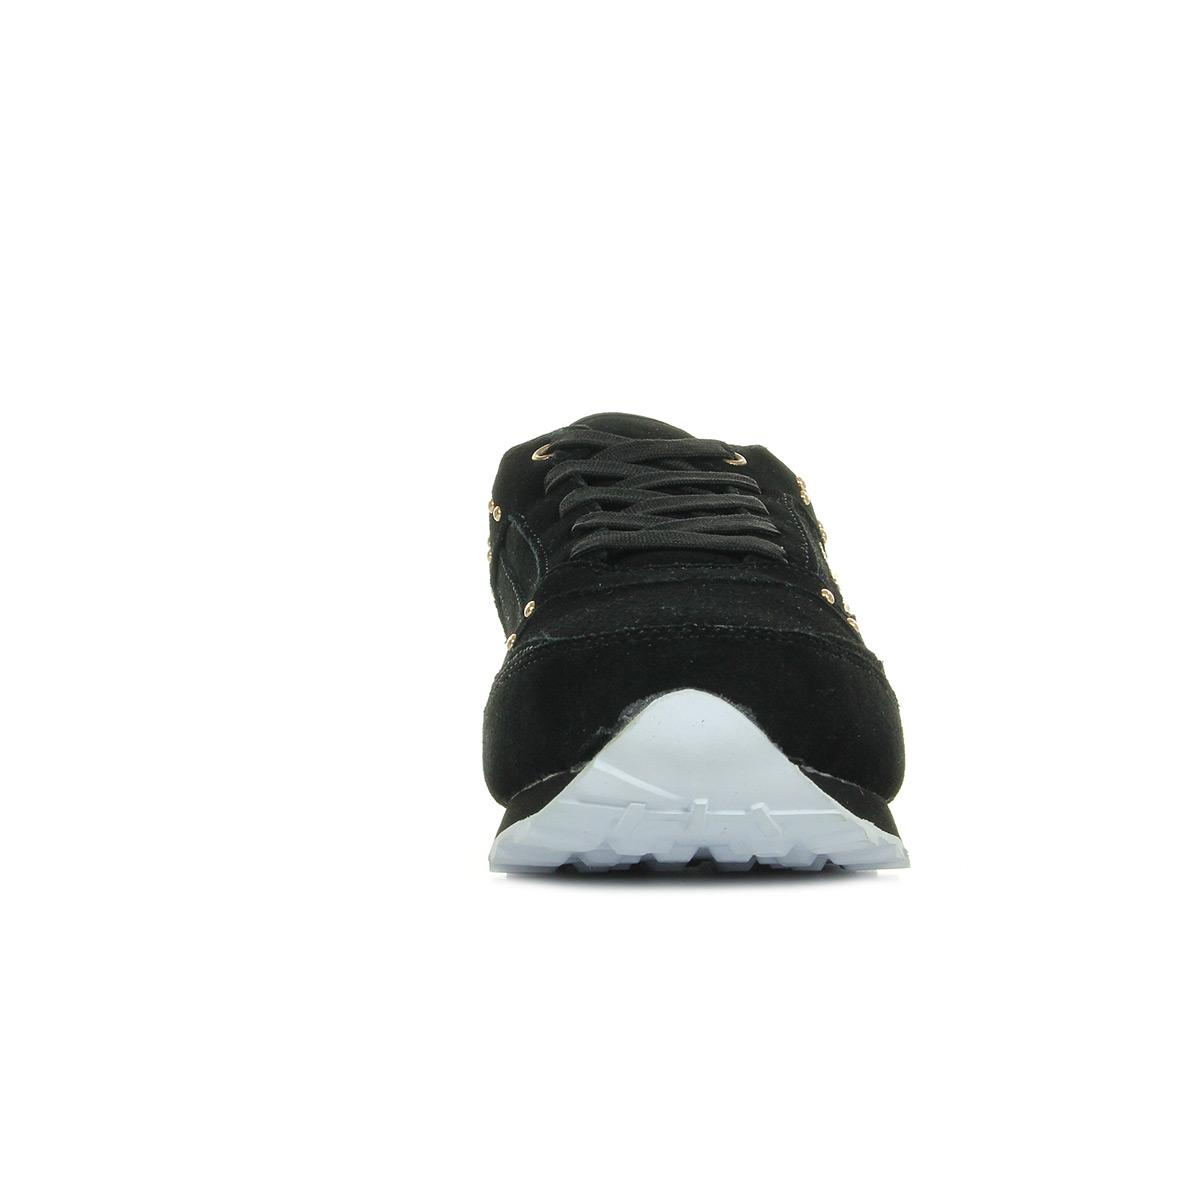 Versace Jeans Linea Fondo Amber Dis2 Suede E0VRBSD270019899, Baskets mode femme